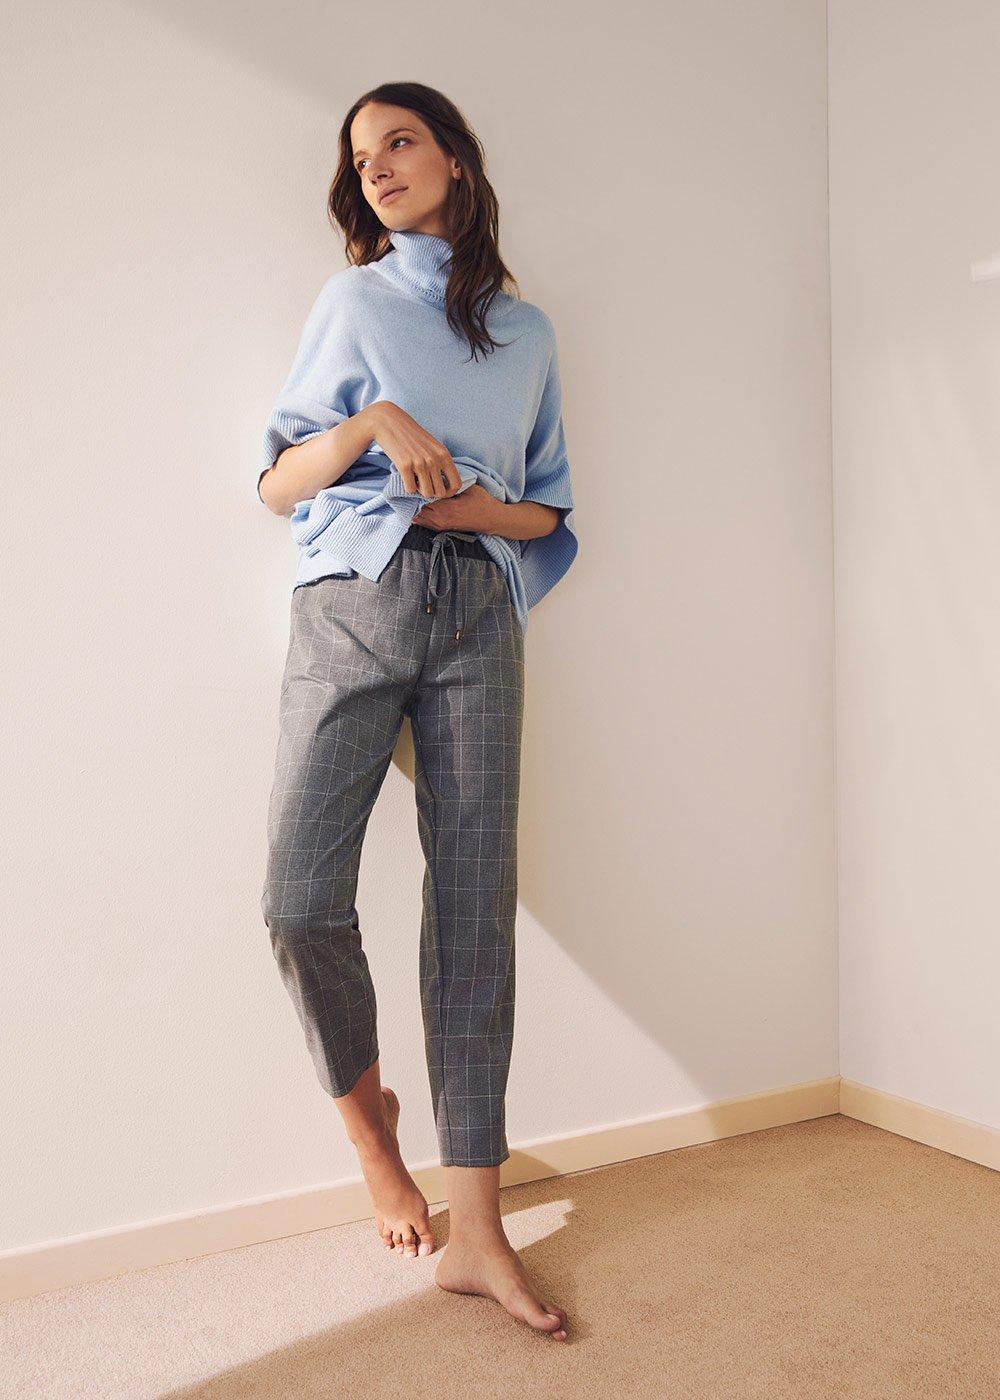 Cara flannel fabric trousers - L.grey\White Fantasia - Woman